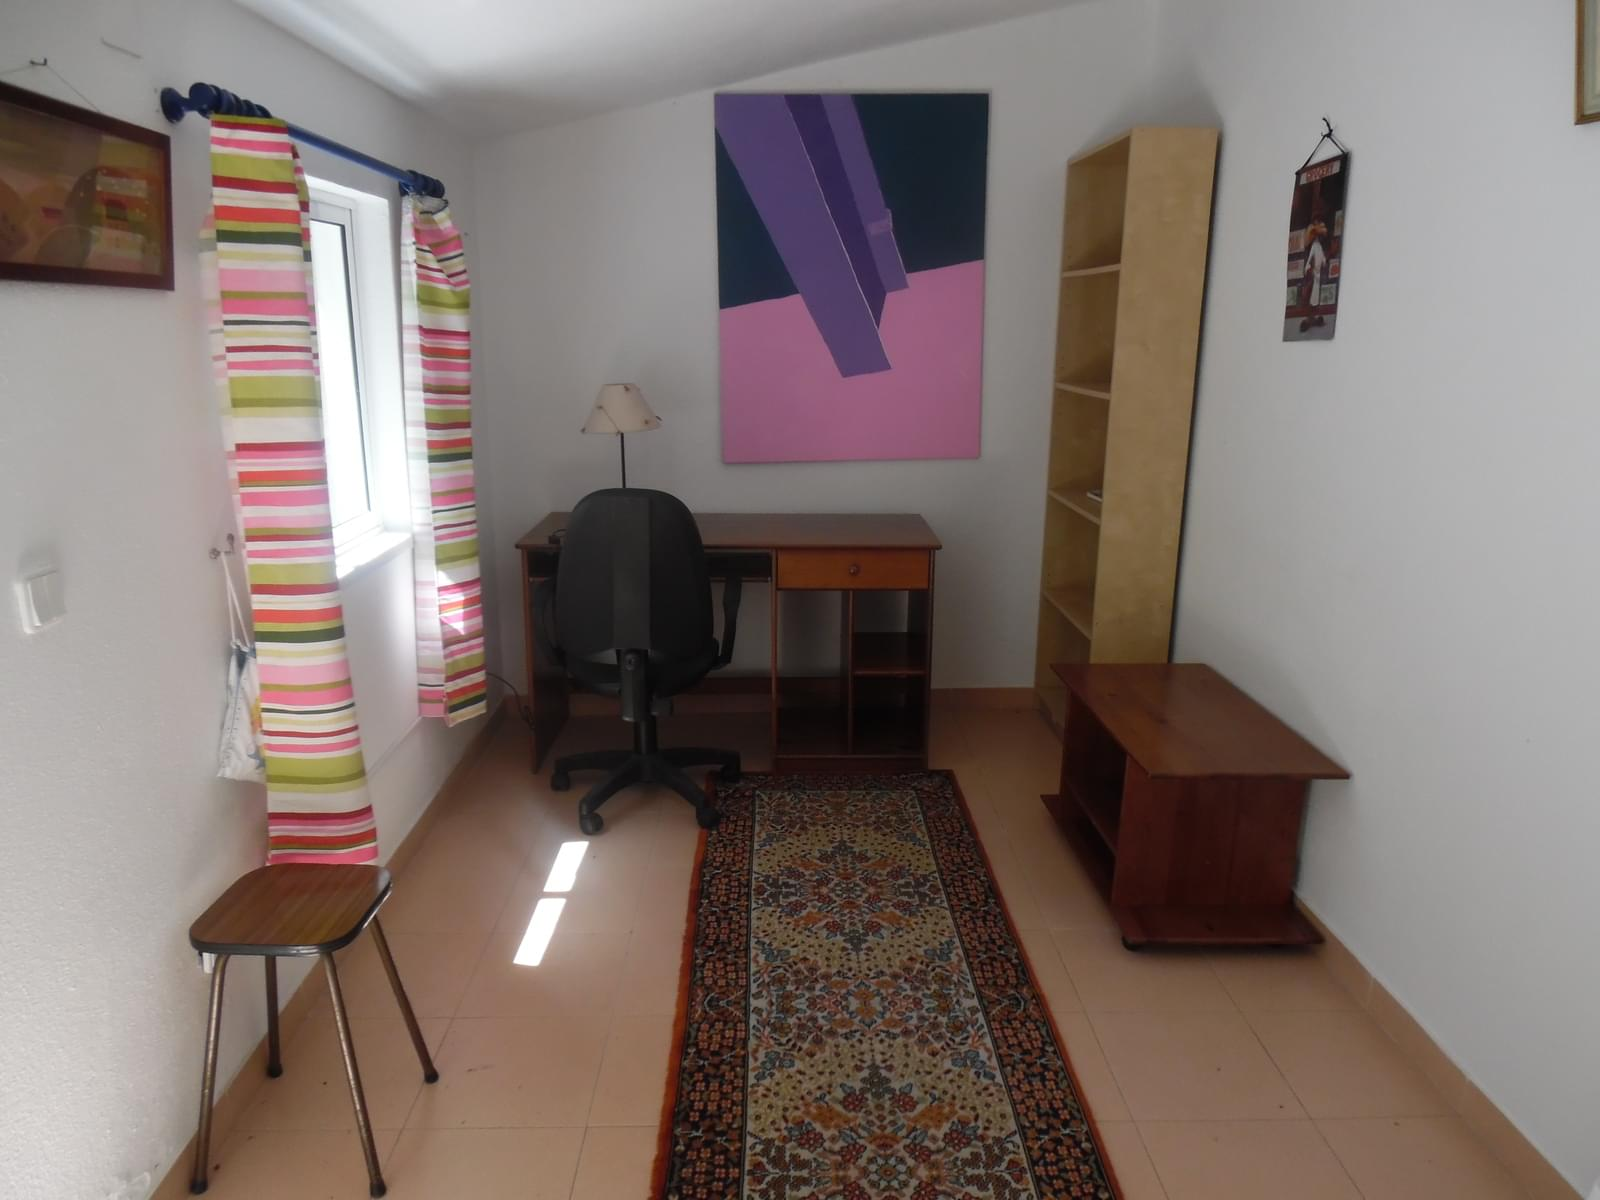 pf17147-apartamento-t2-lisboa-a3f193f8-0b22-431e-8a9a-c833637566ea